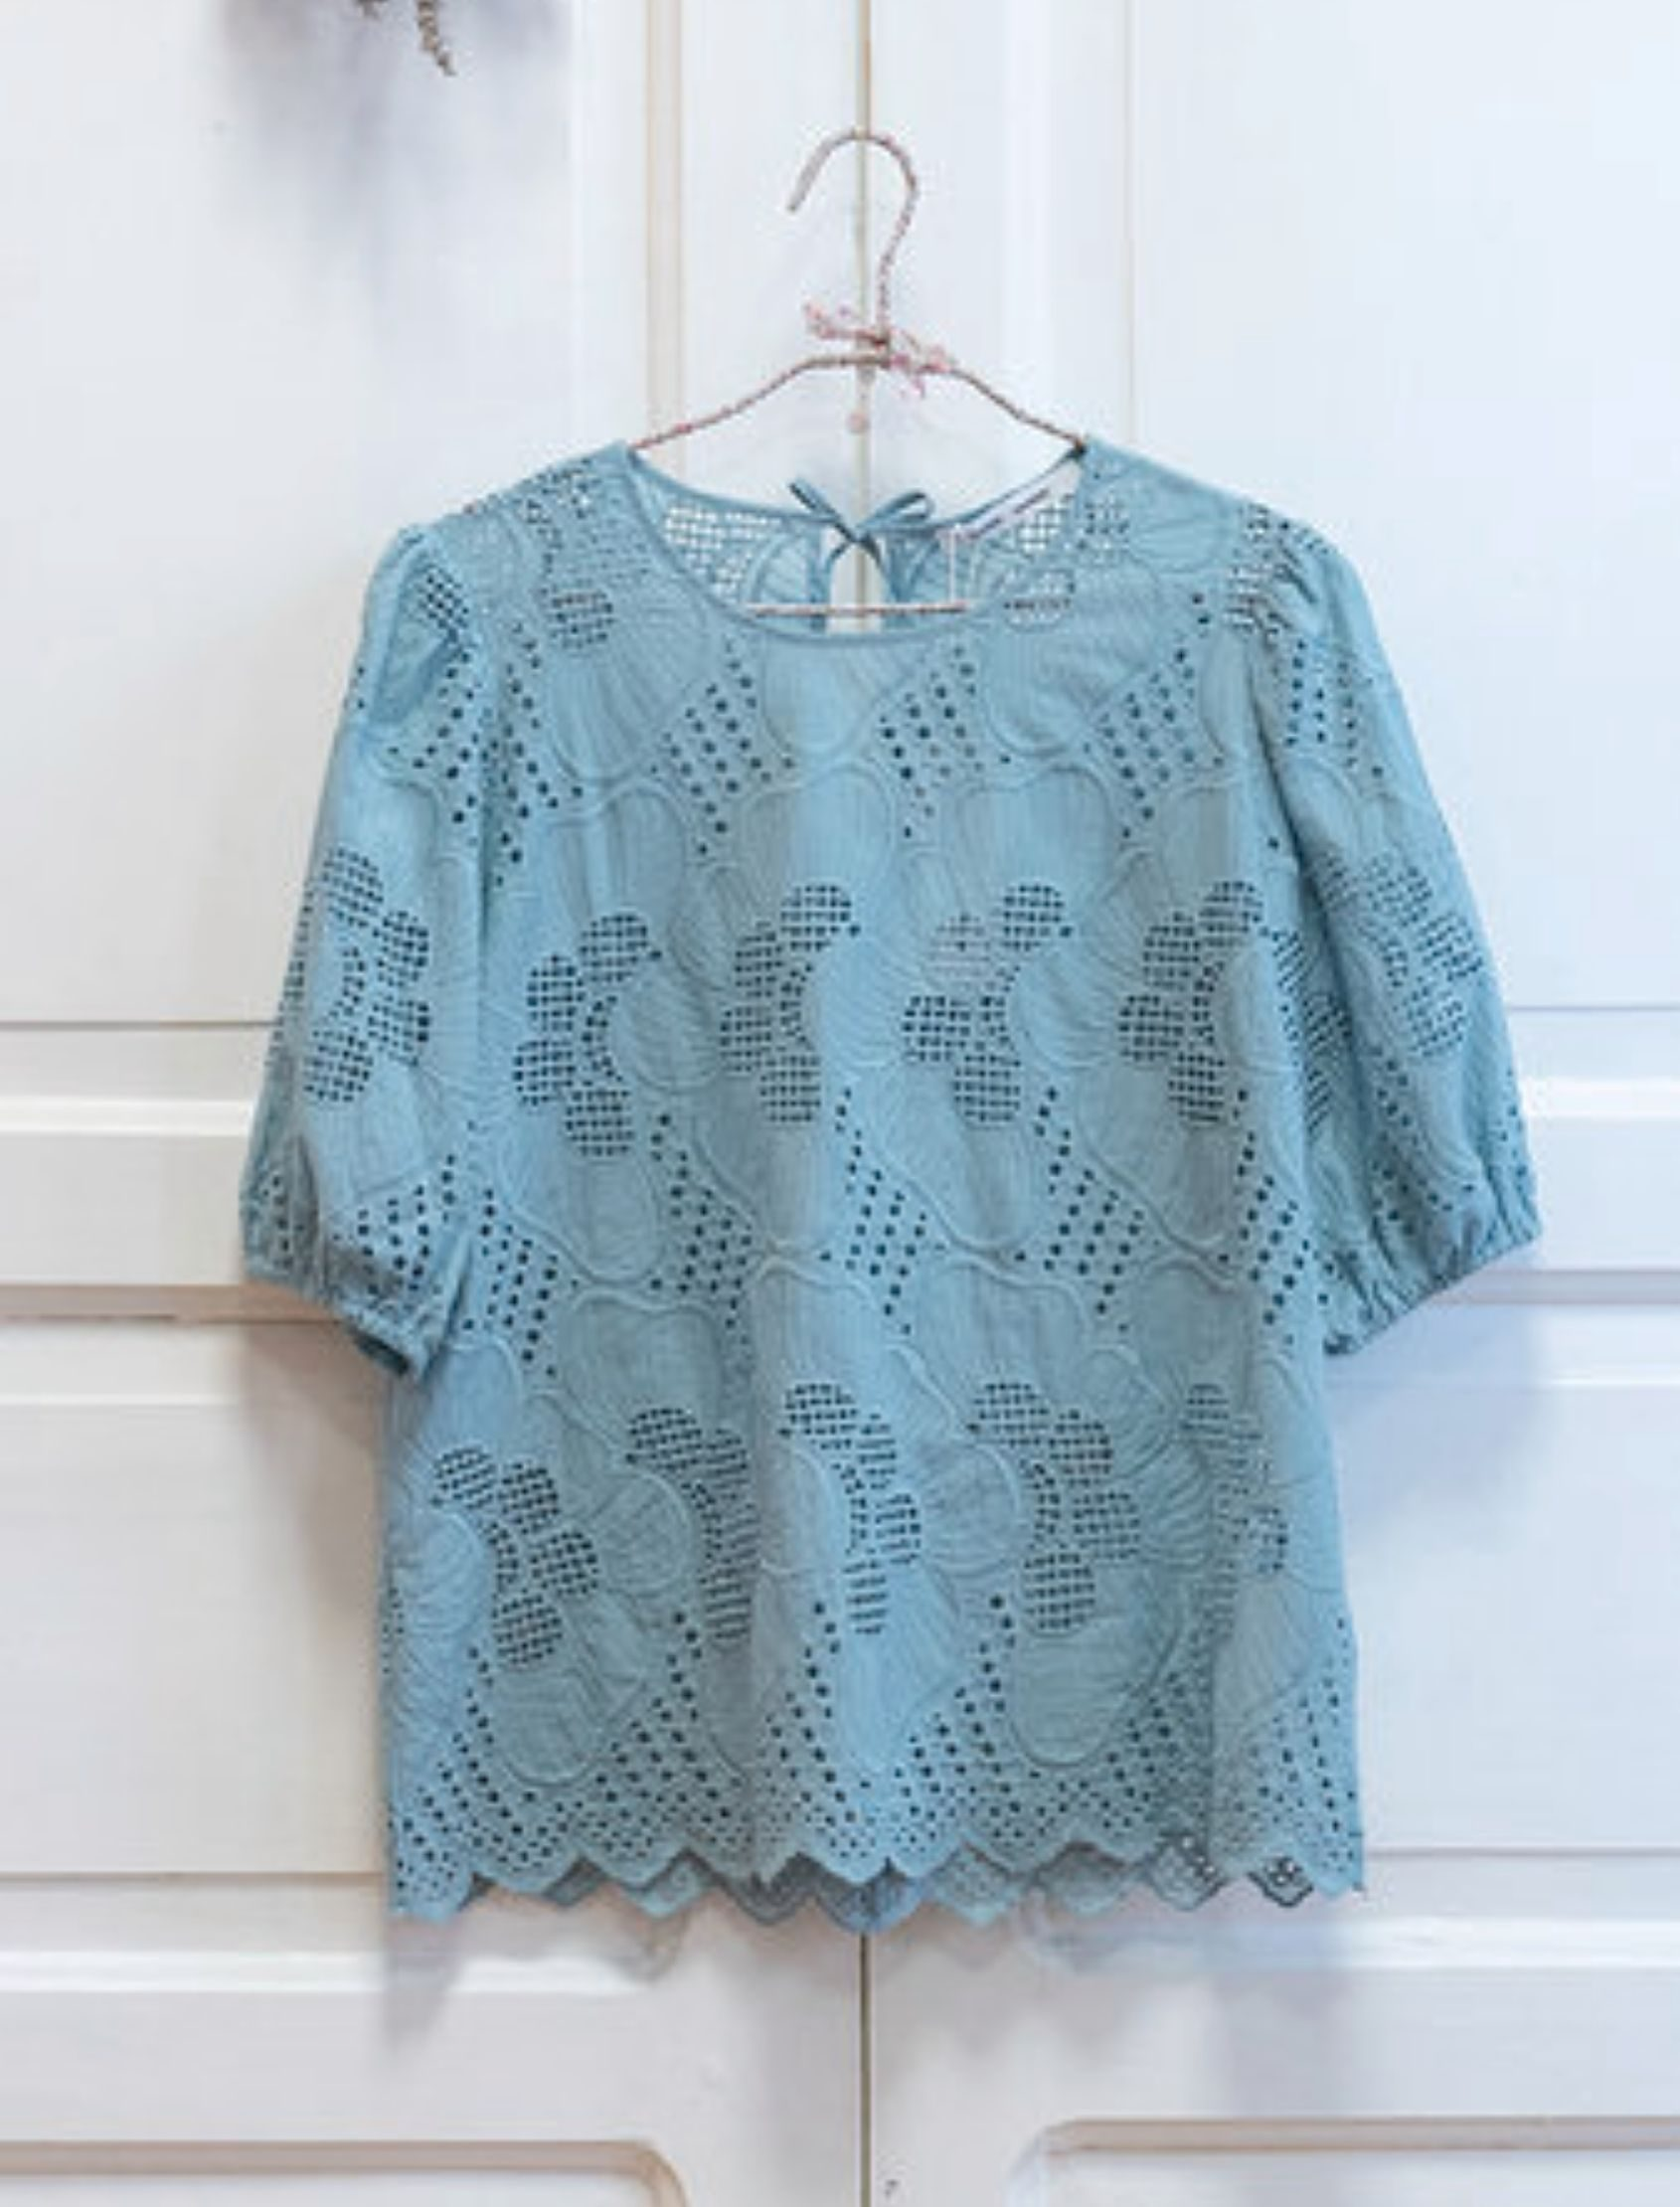 blusa de mujer juni de manga corta en color celeste de la marca samsoe samsoe